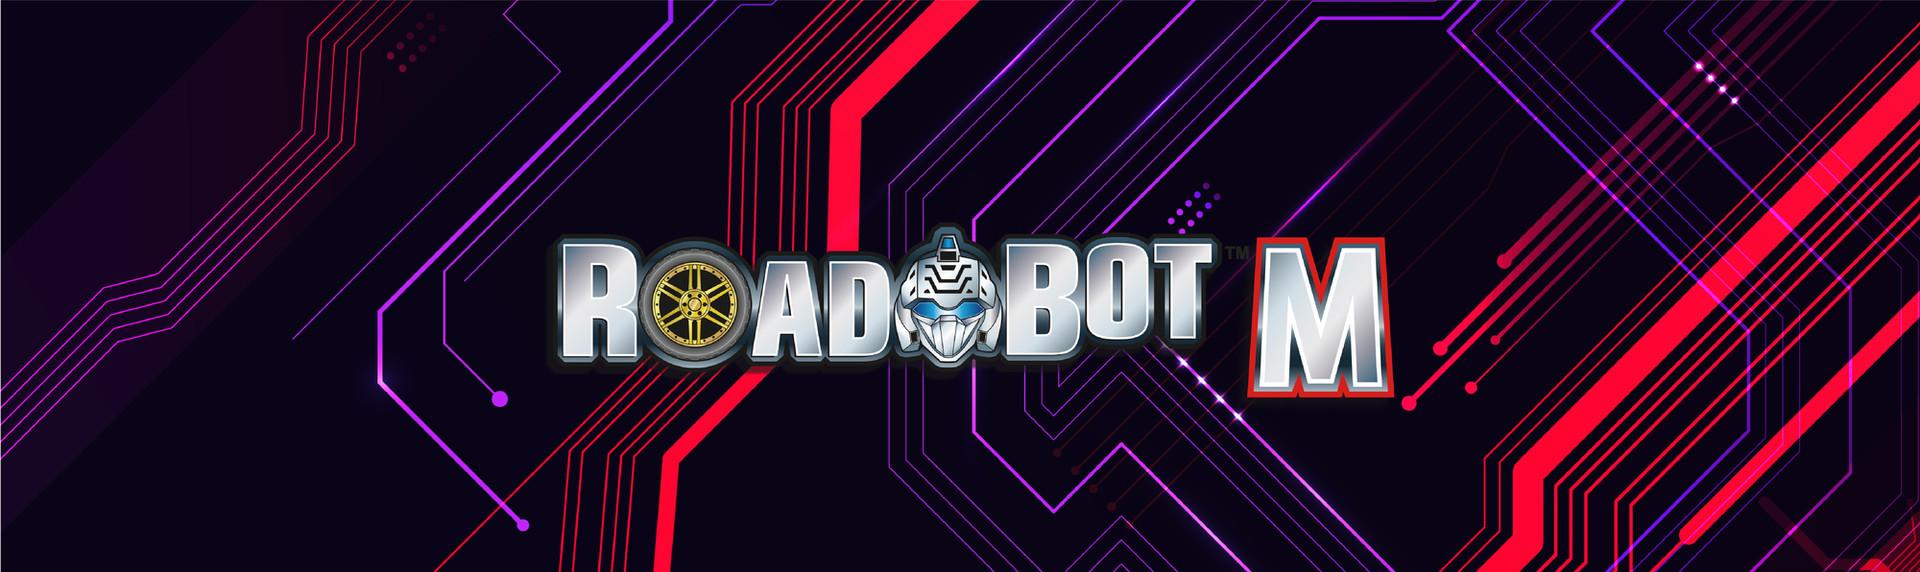 Roadbot M Collection